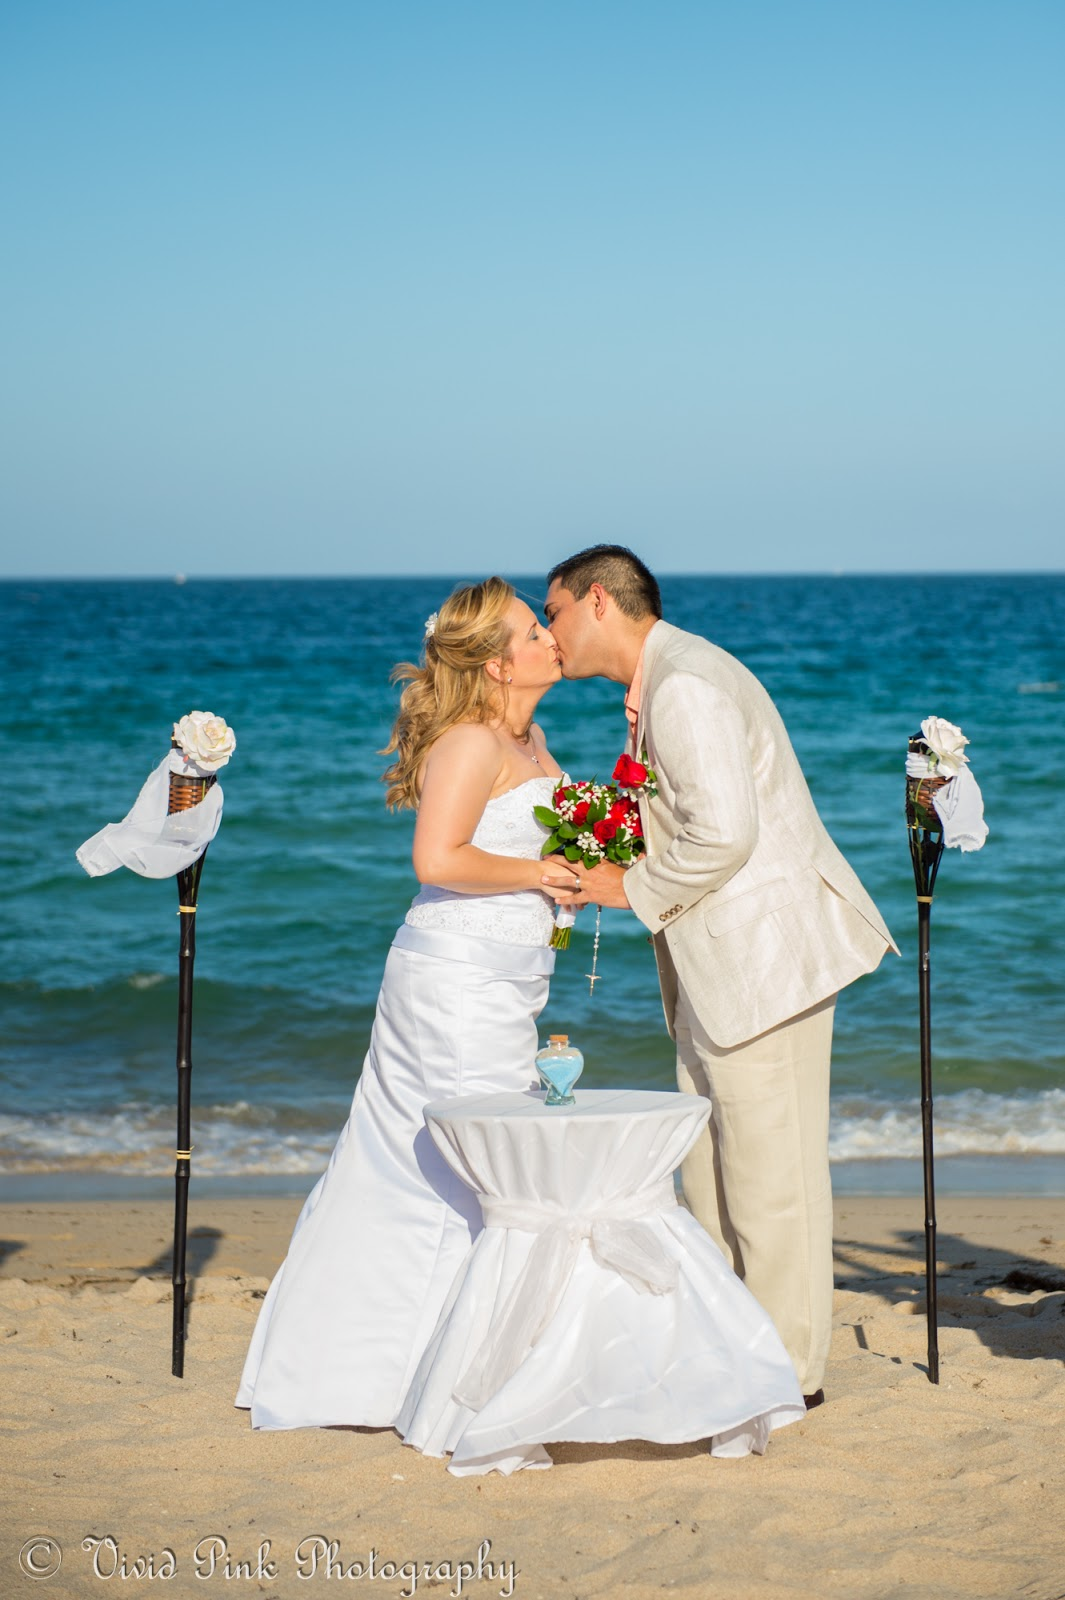 Affordable Beach Weddings 3057934387 VANELLY  CARLOS  FT LAUDERDALE BEACH WEDDING